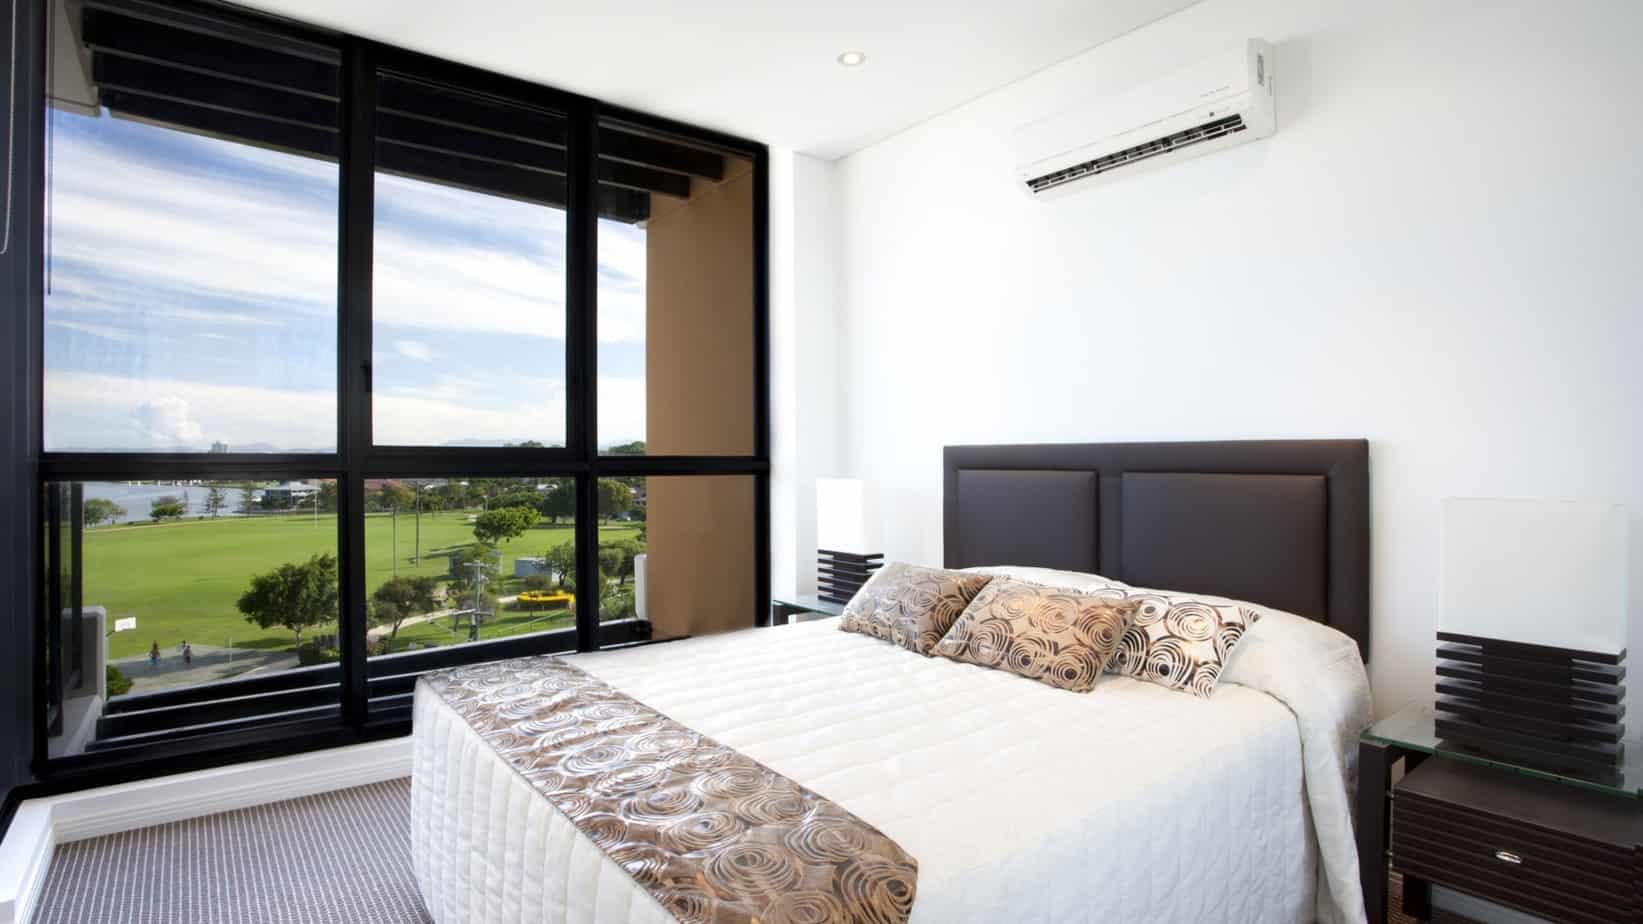 airco in slaapkamer